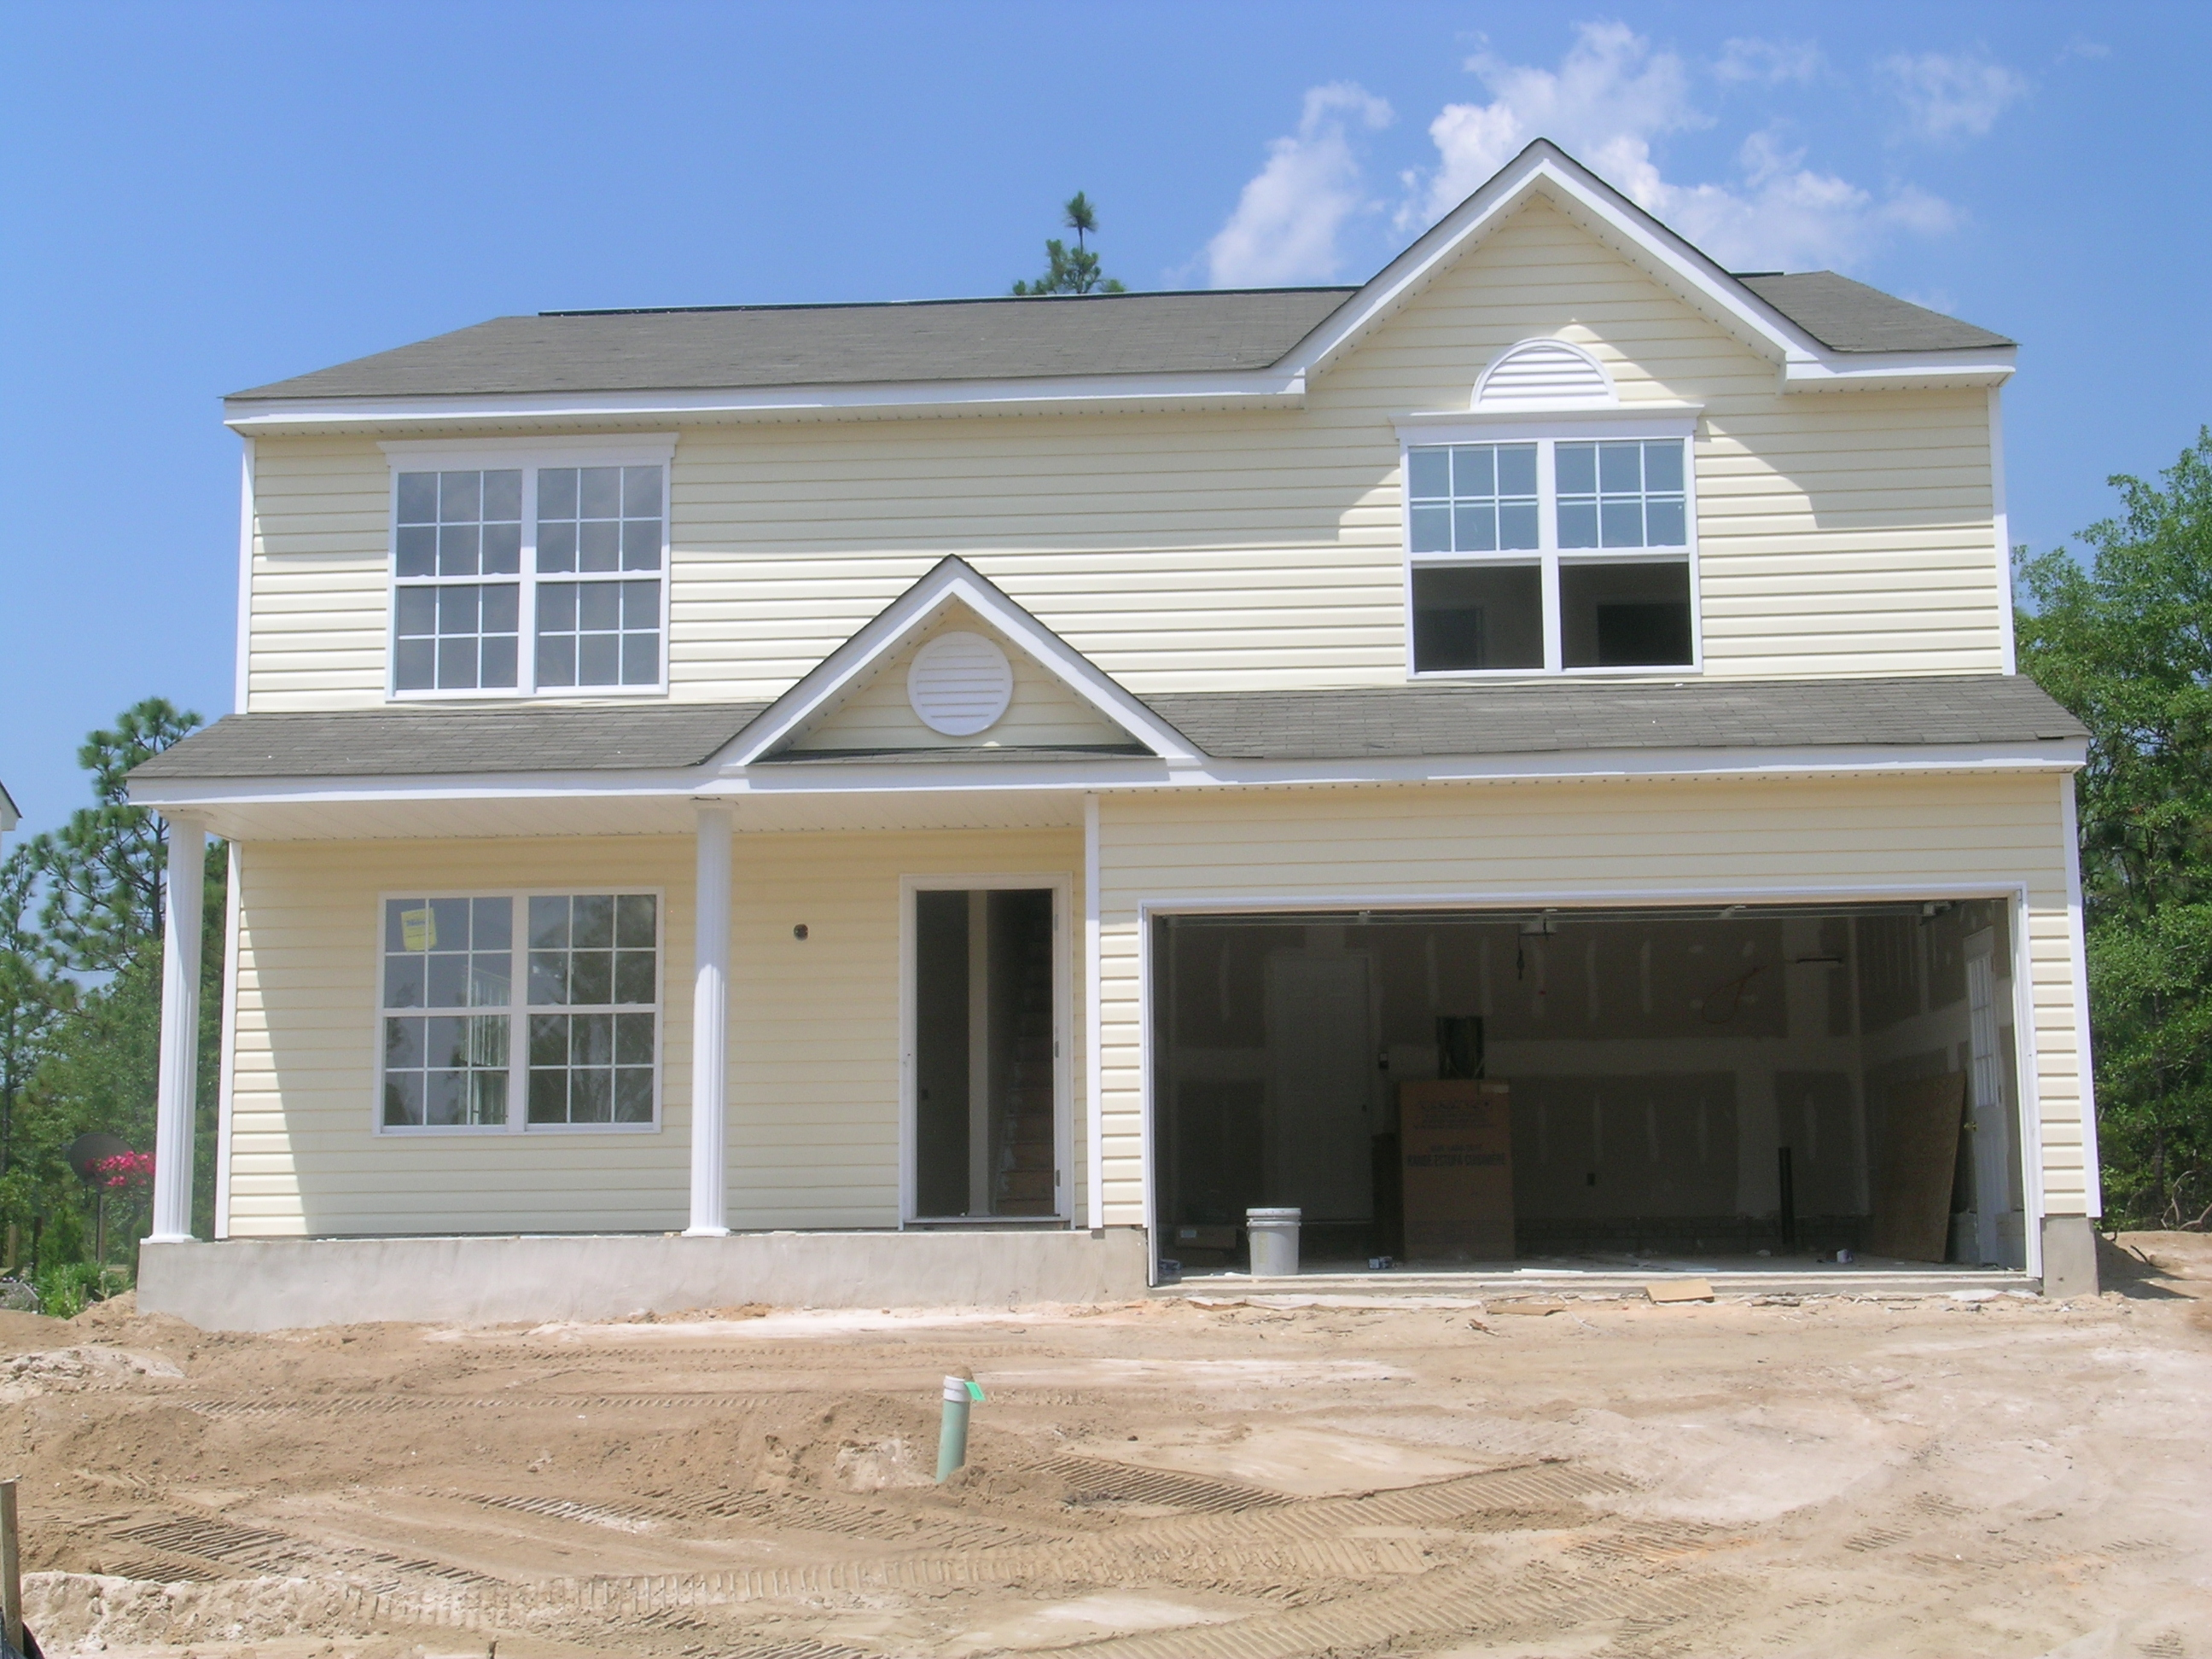 Rymarc homes floor plans Home decor ideas – Rymarc Homes Floor Plans